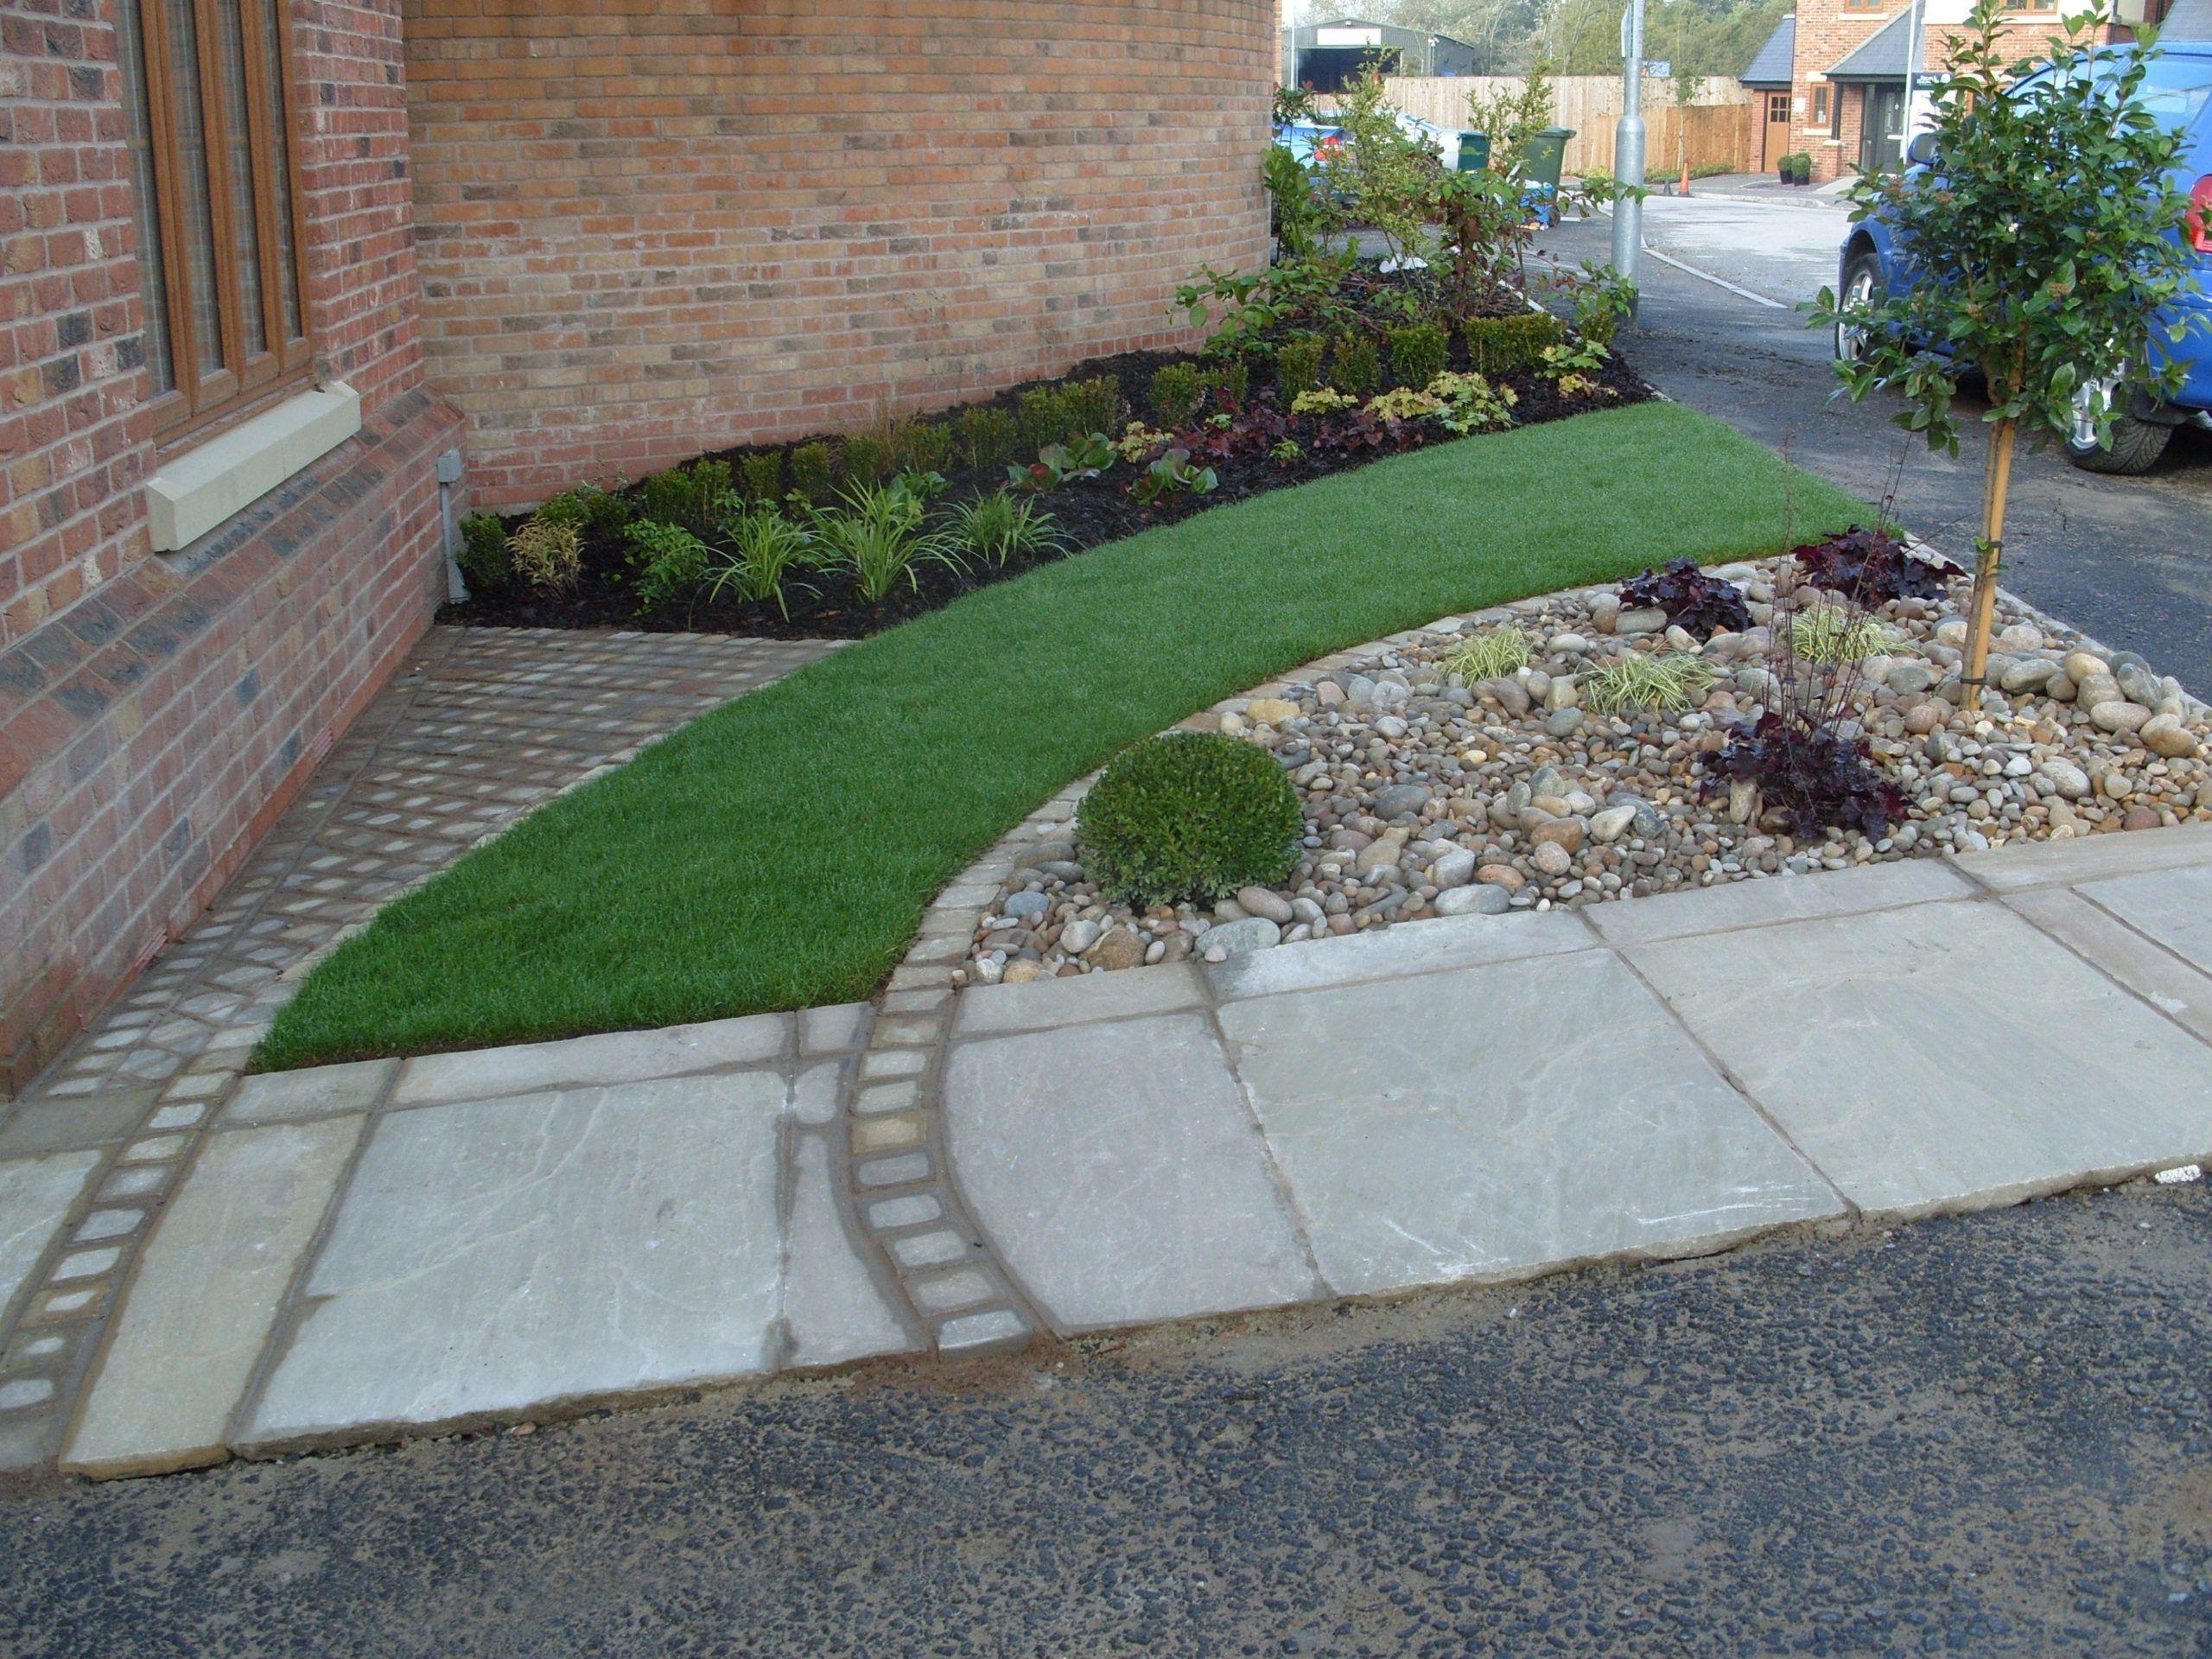 33++ Driveway design ideas landscaping uk ideas in 2021